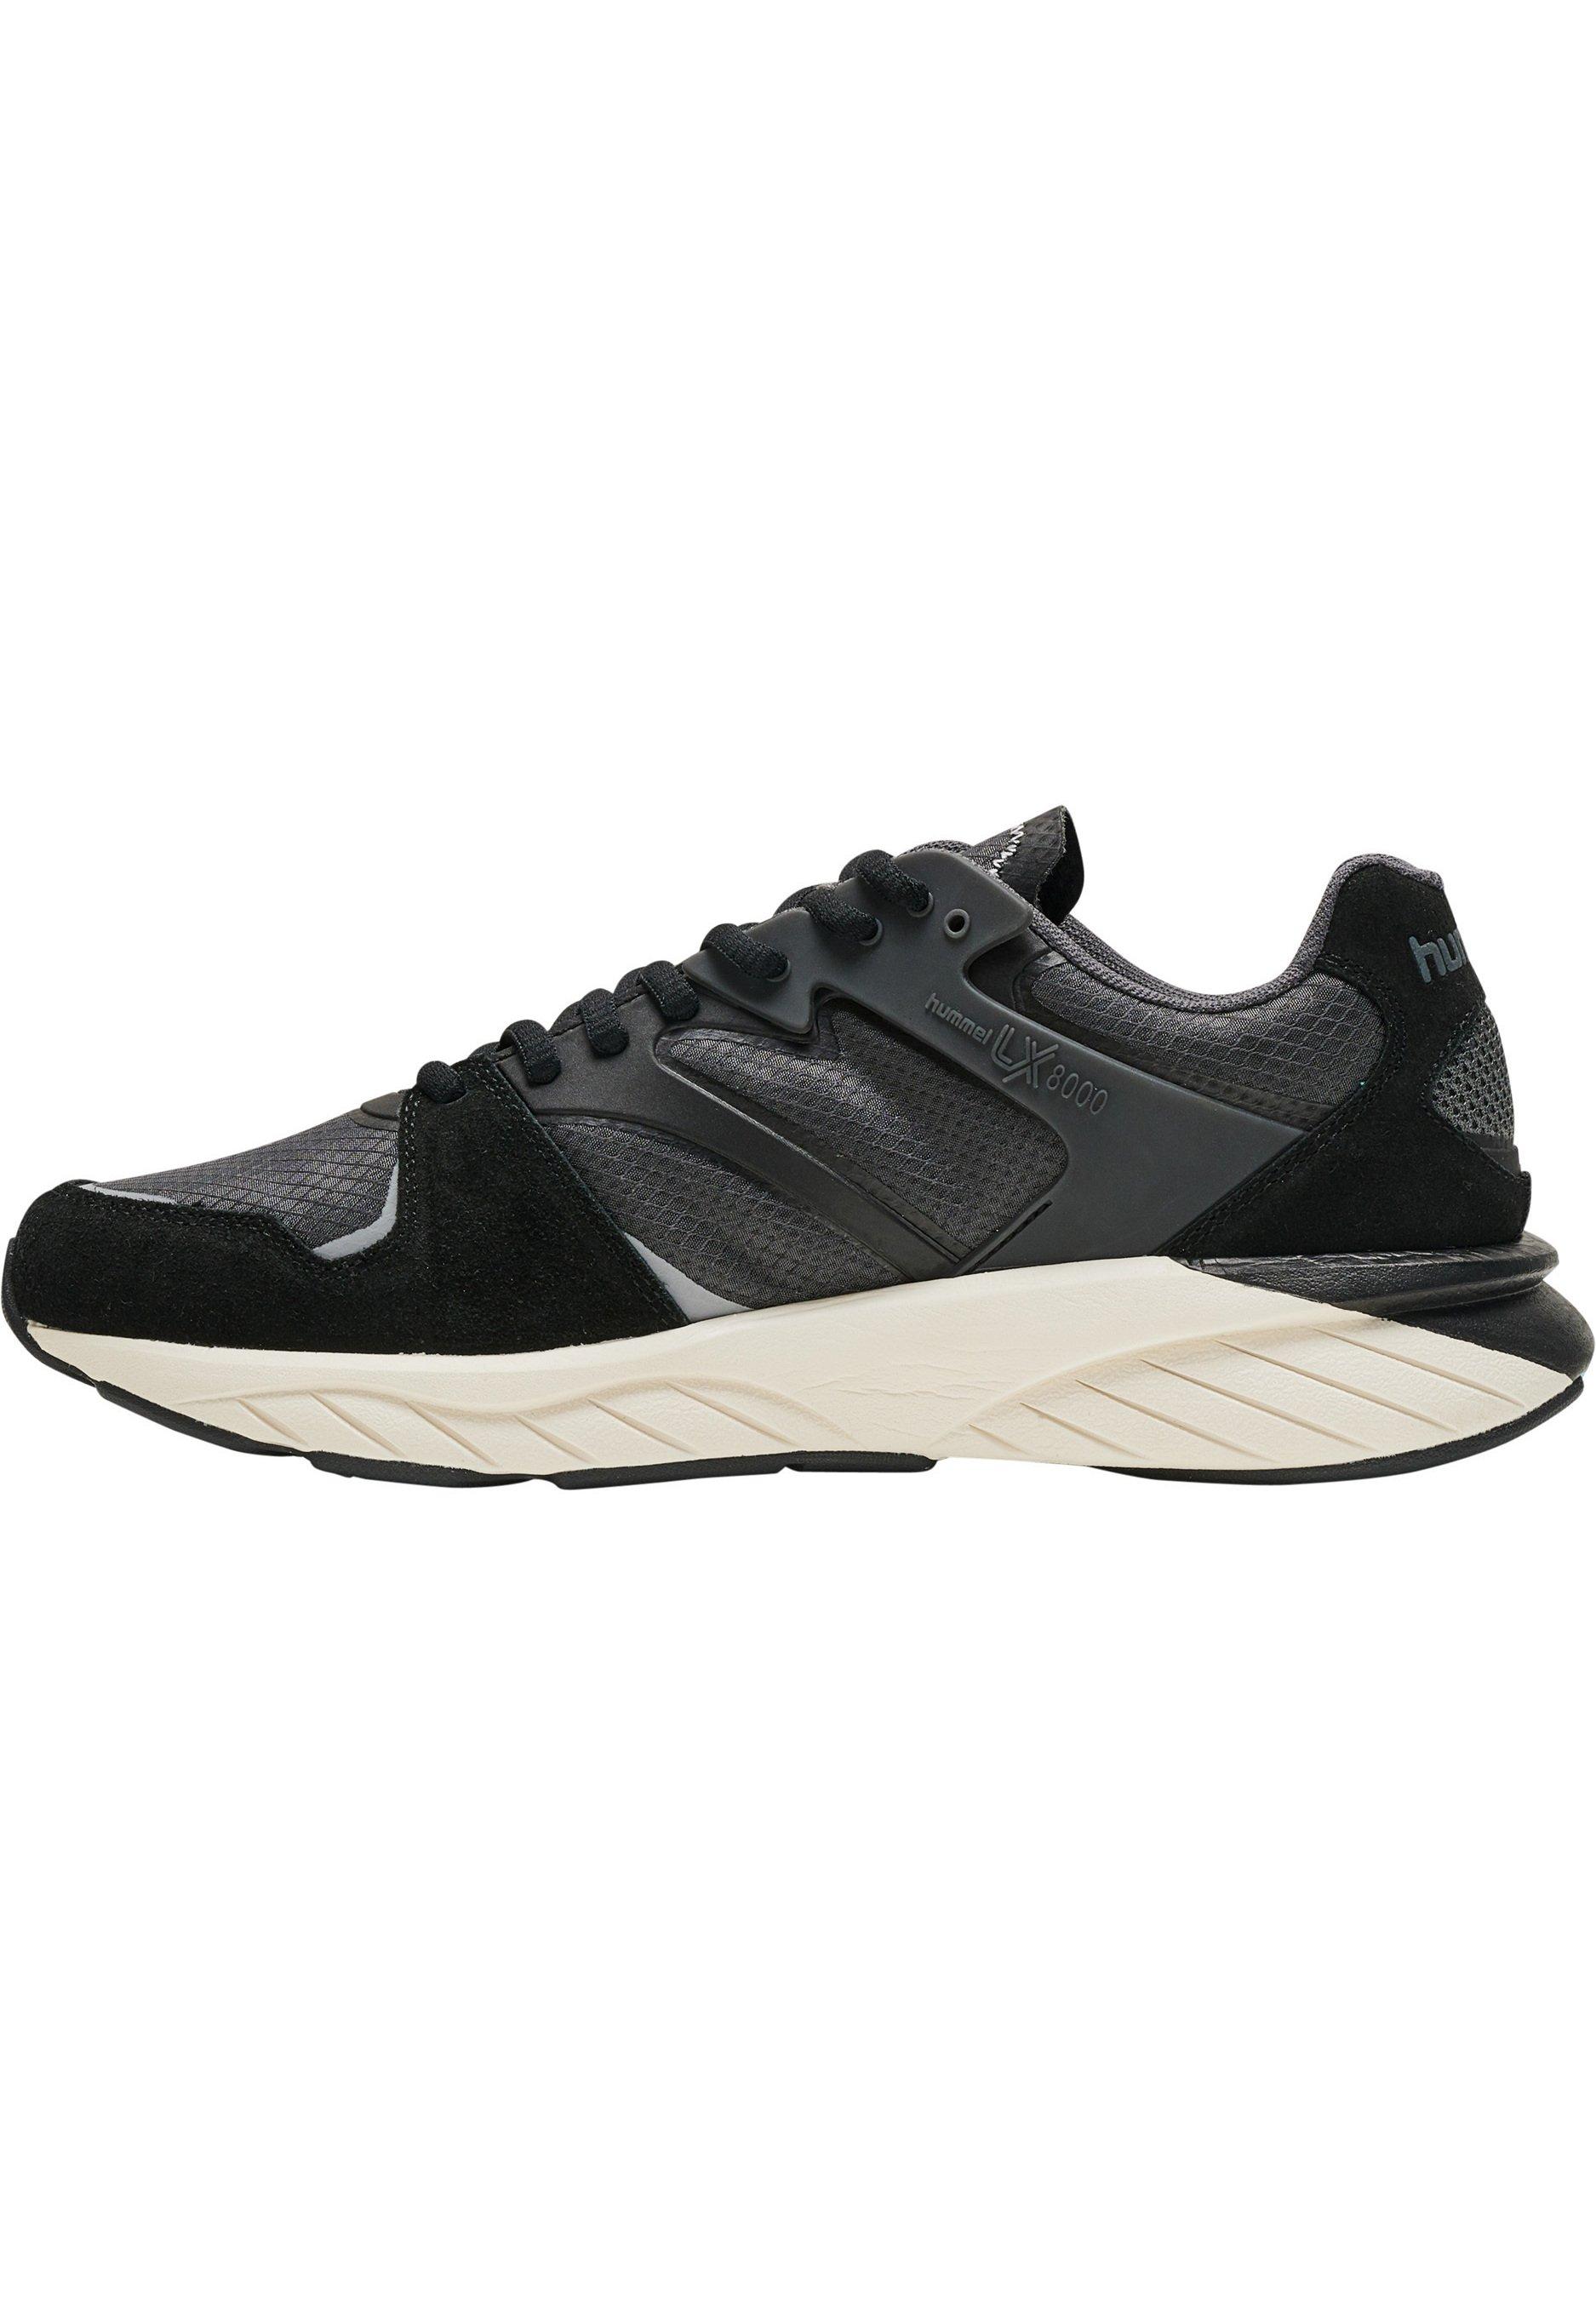 Herren REACH LX 8000 - Sneaker low